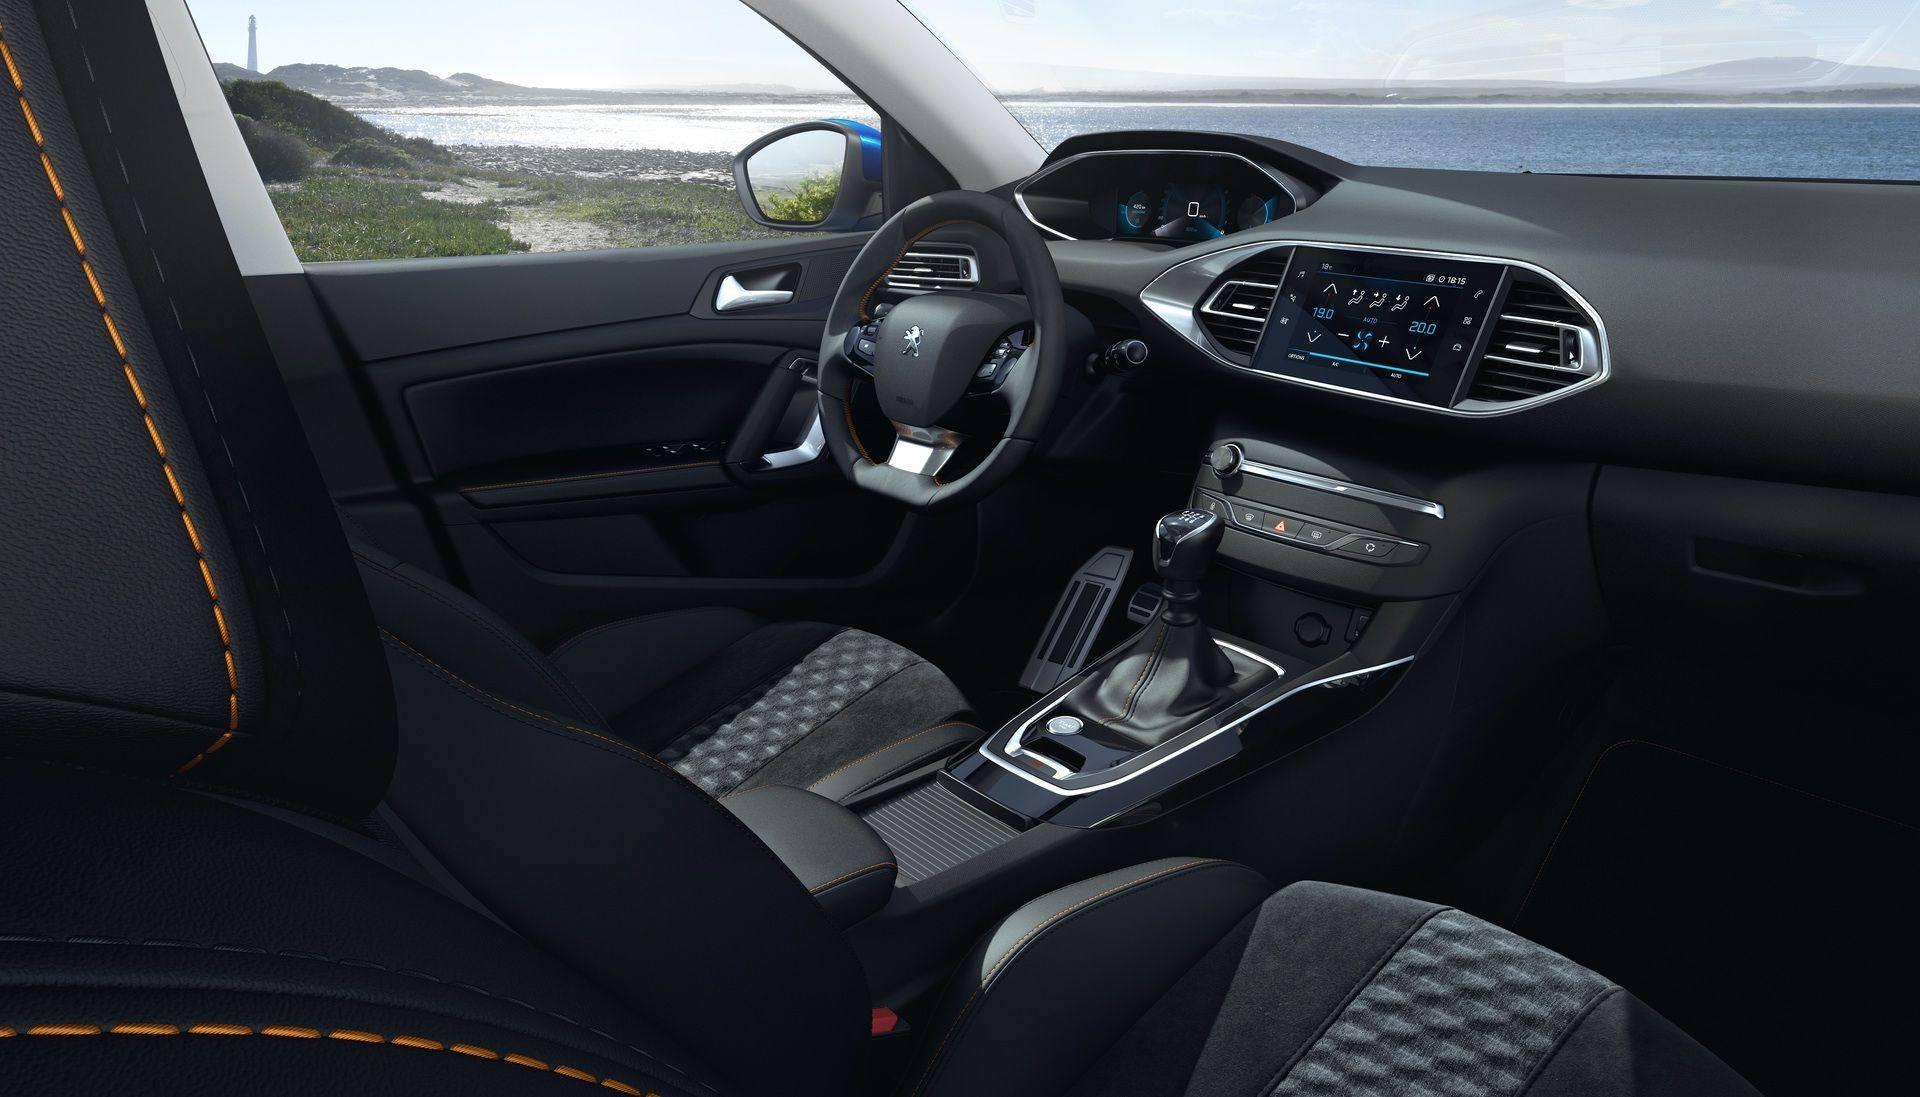 2020_Peugeot_308_facelift_0020